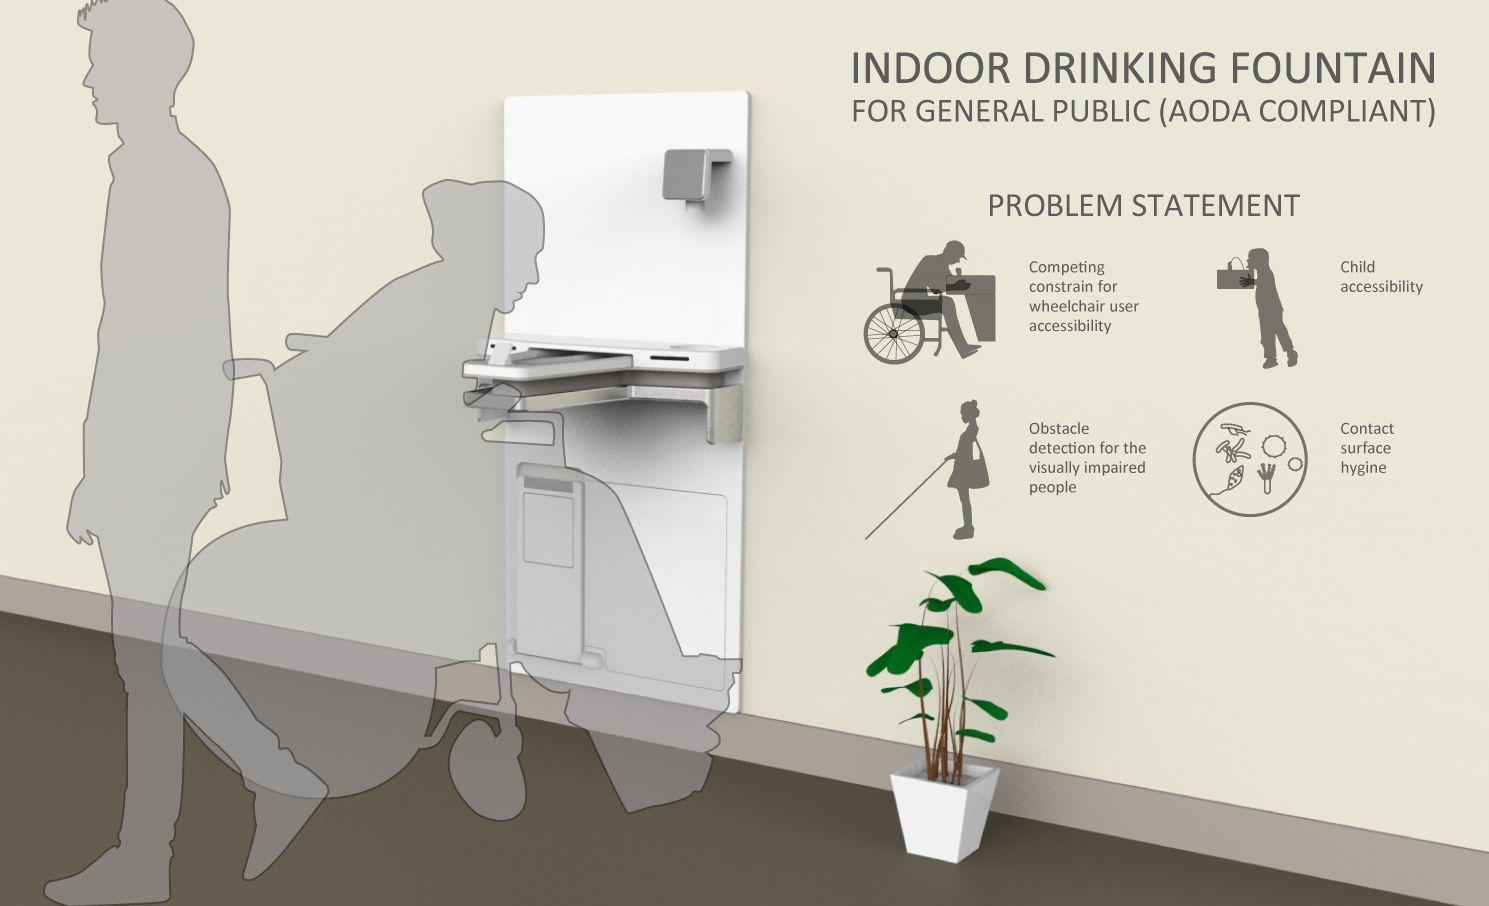 Indoor Drinking Fountain Design For General Public Aoda Compliant